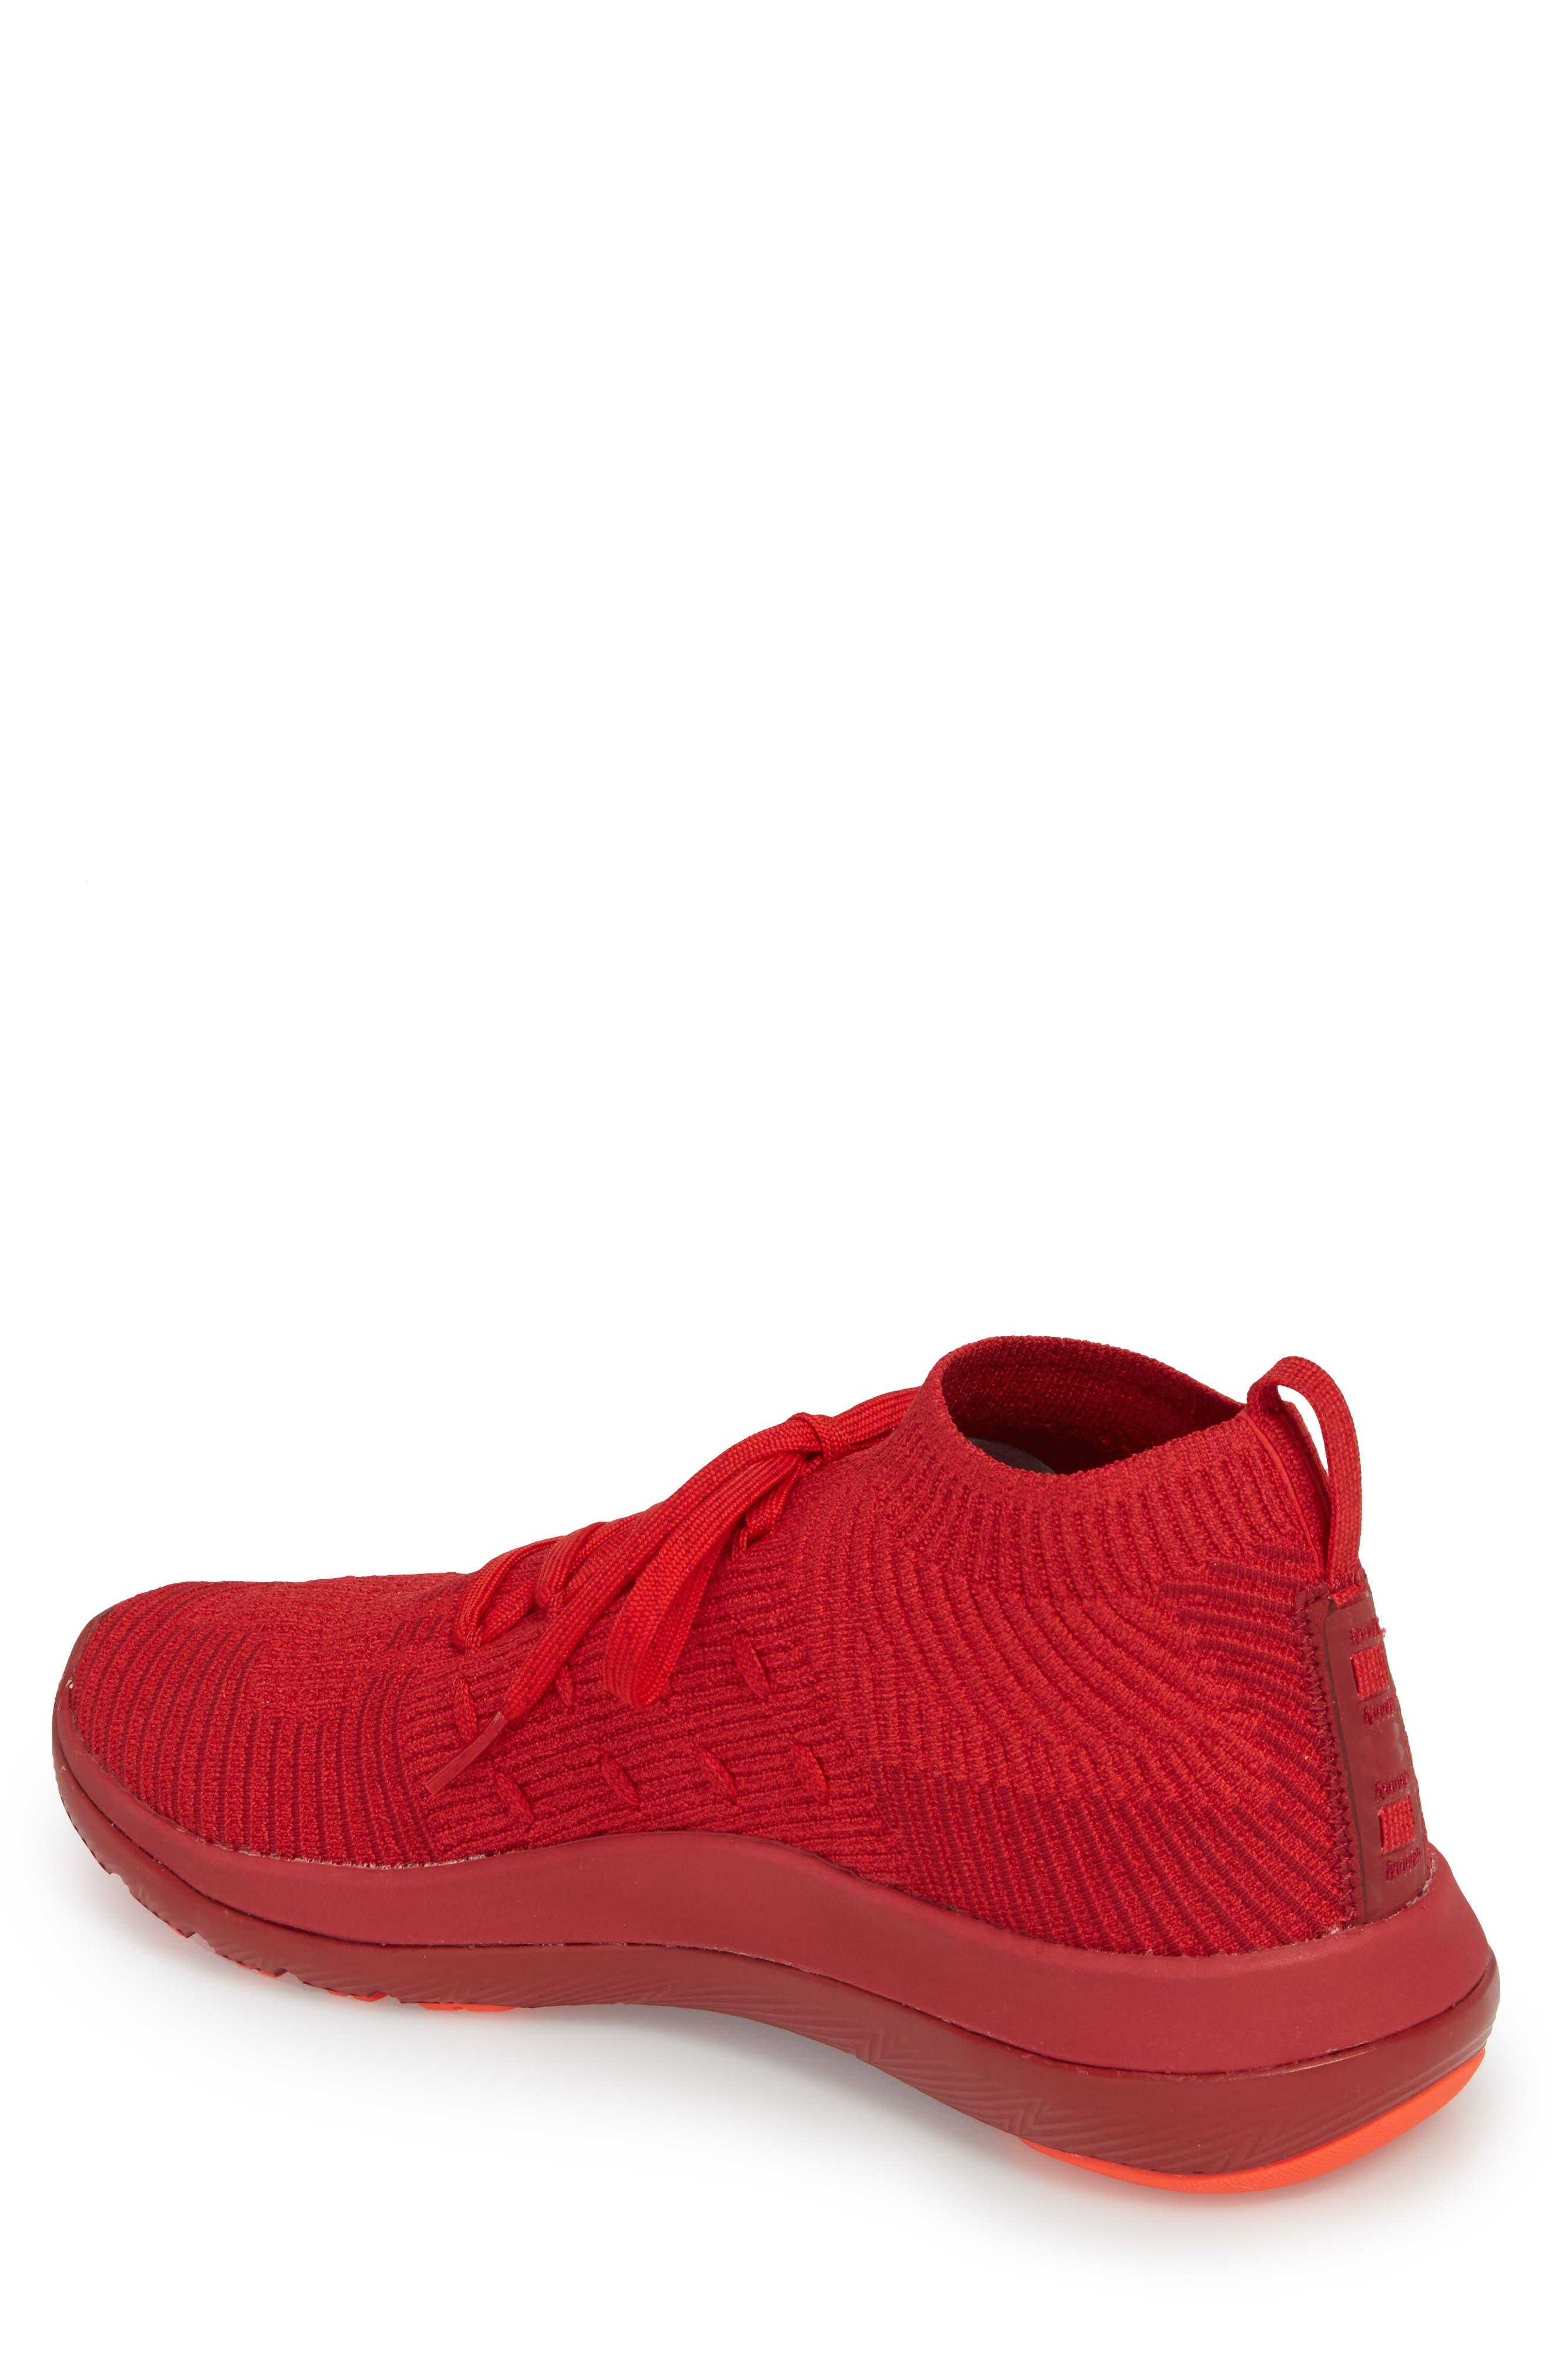 Slingflex Rise Sneaker,                             Alternate thumbnail 2, color,                             Pierce/ Spice Red